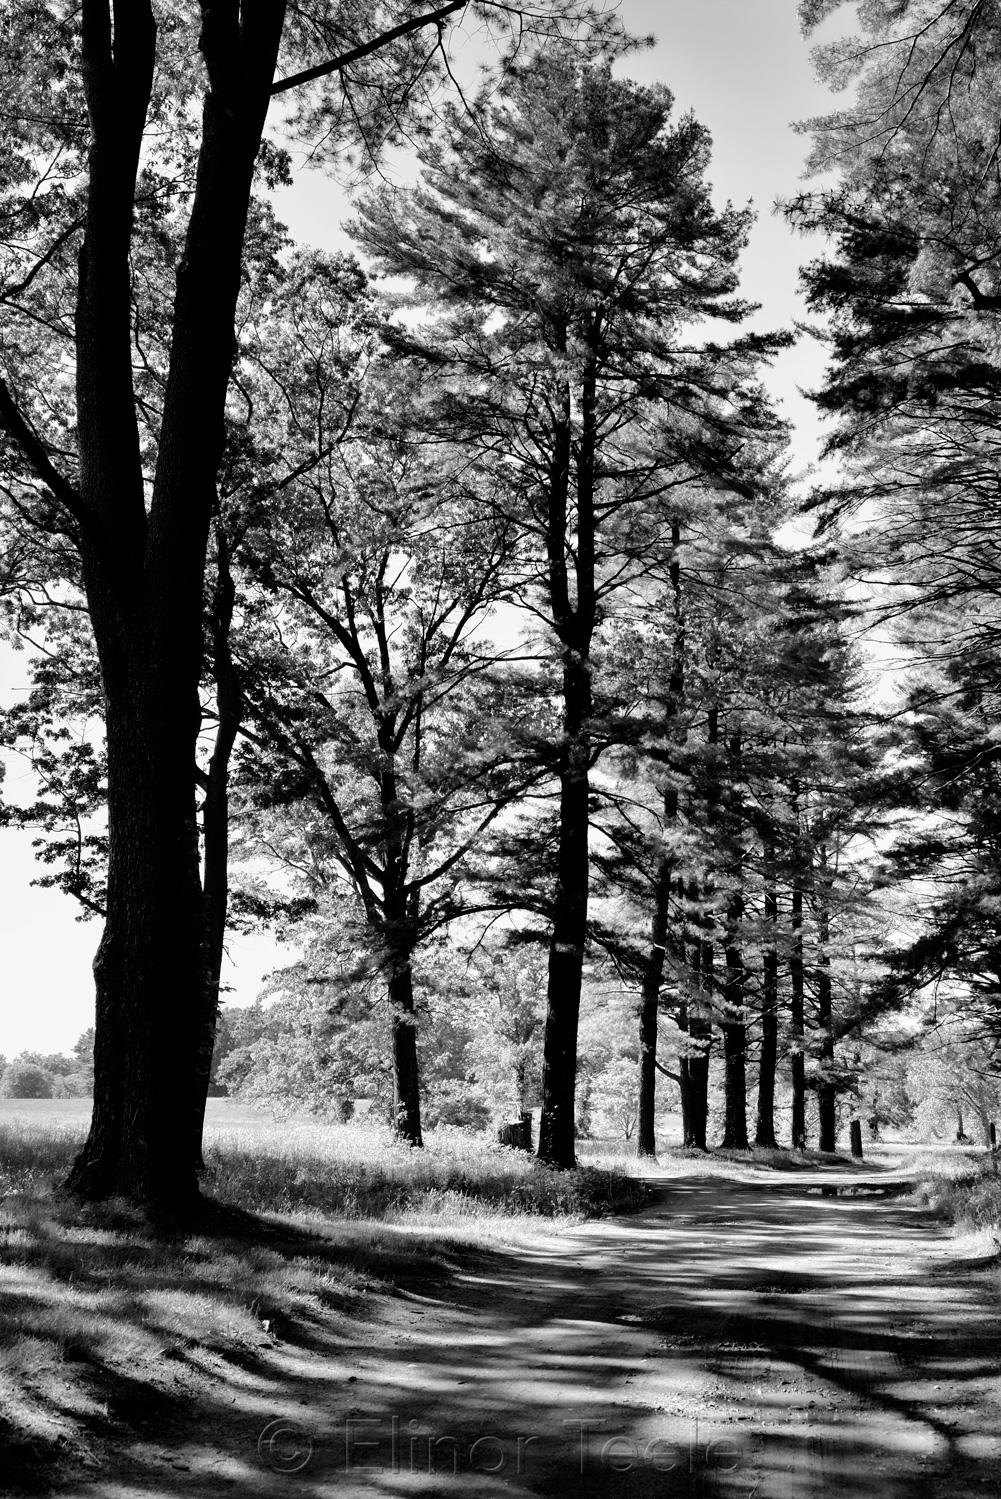 Alley of Evergreens, Appleton Farms (Black & White) 1